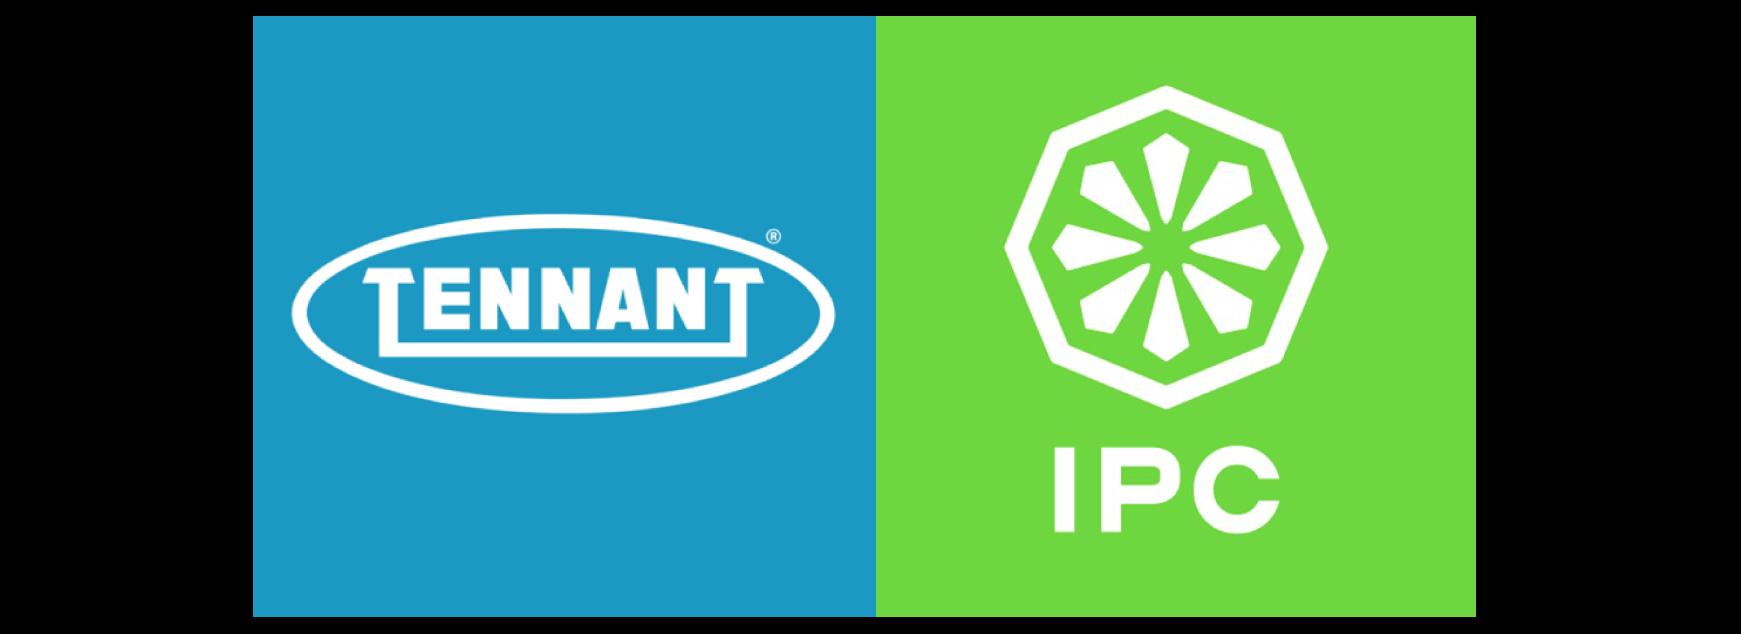 Tennant IPC